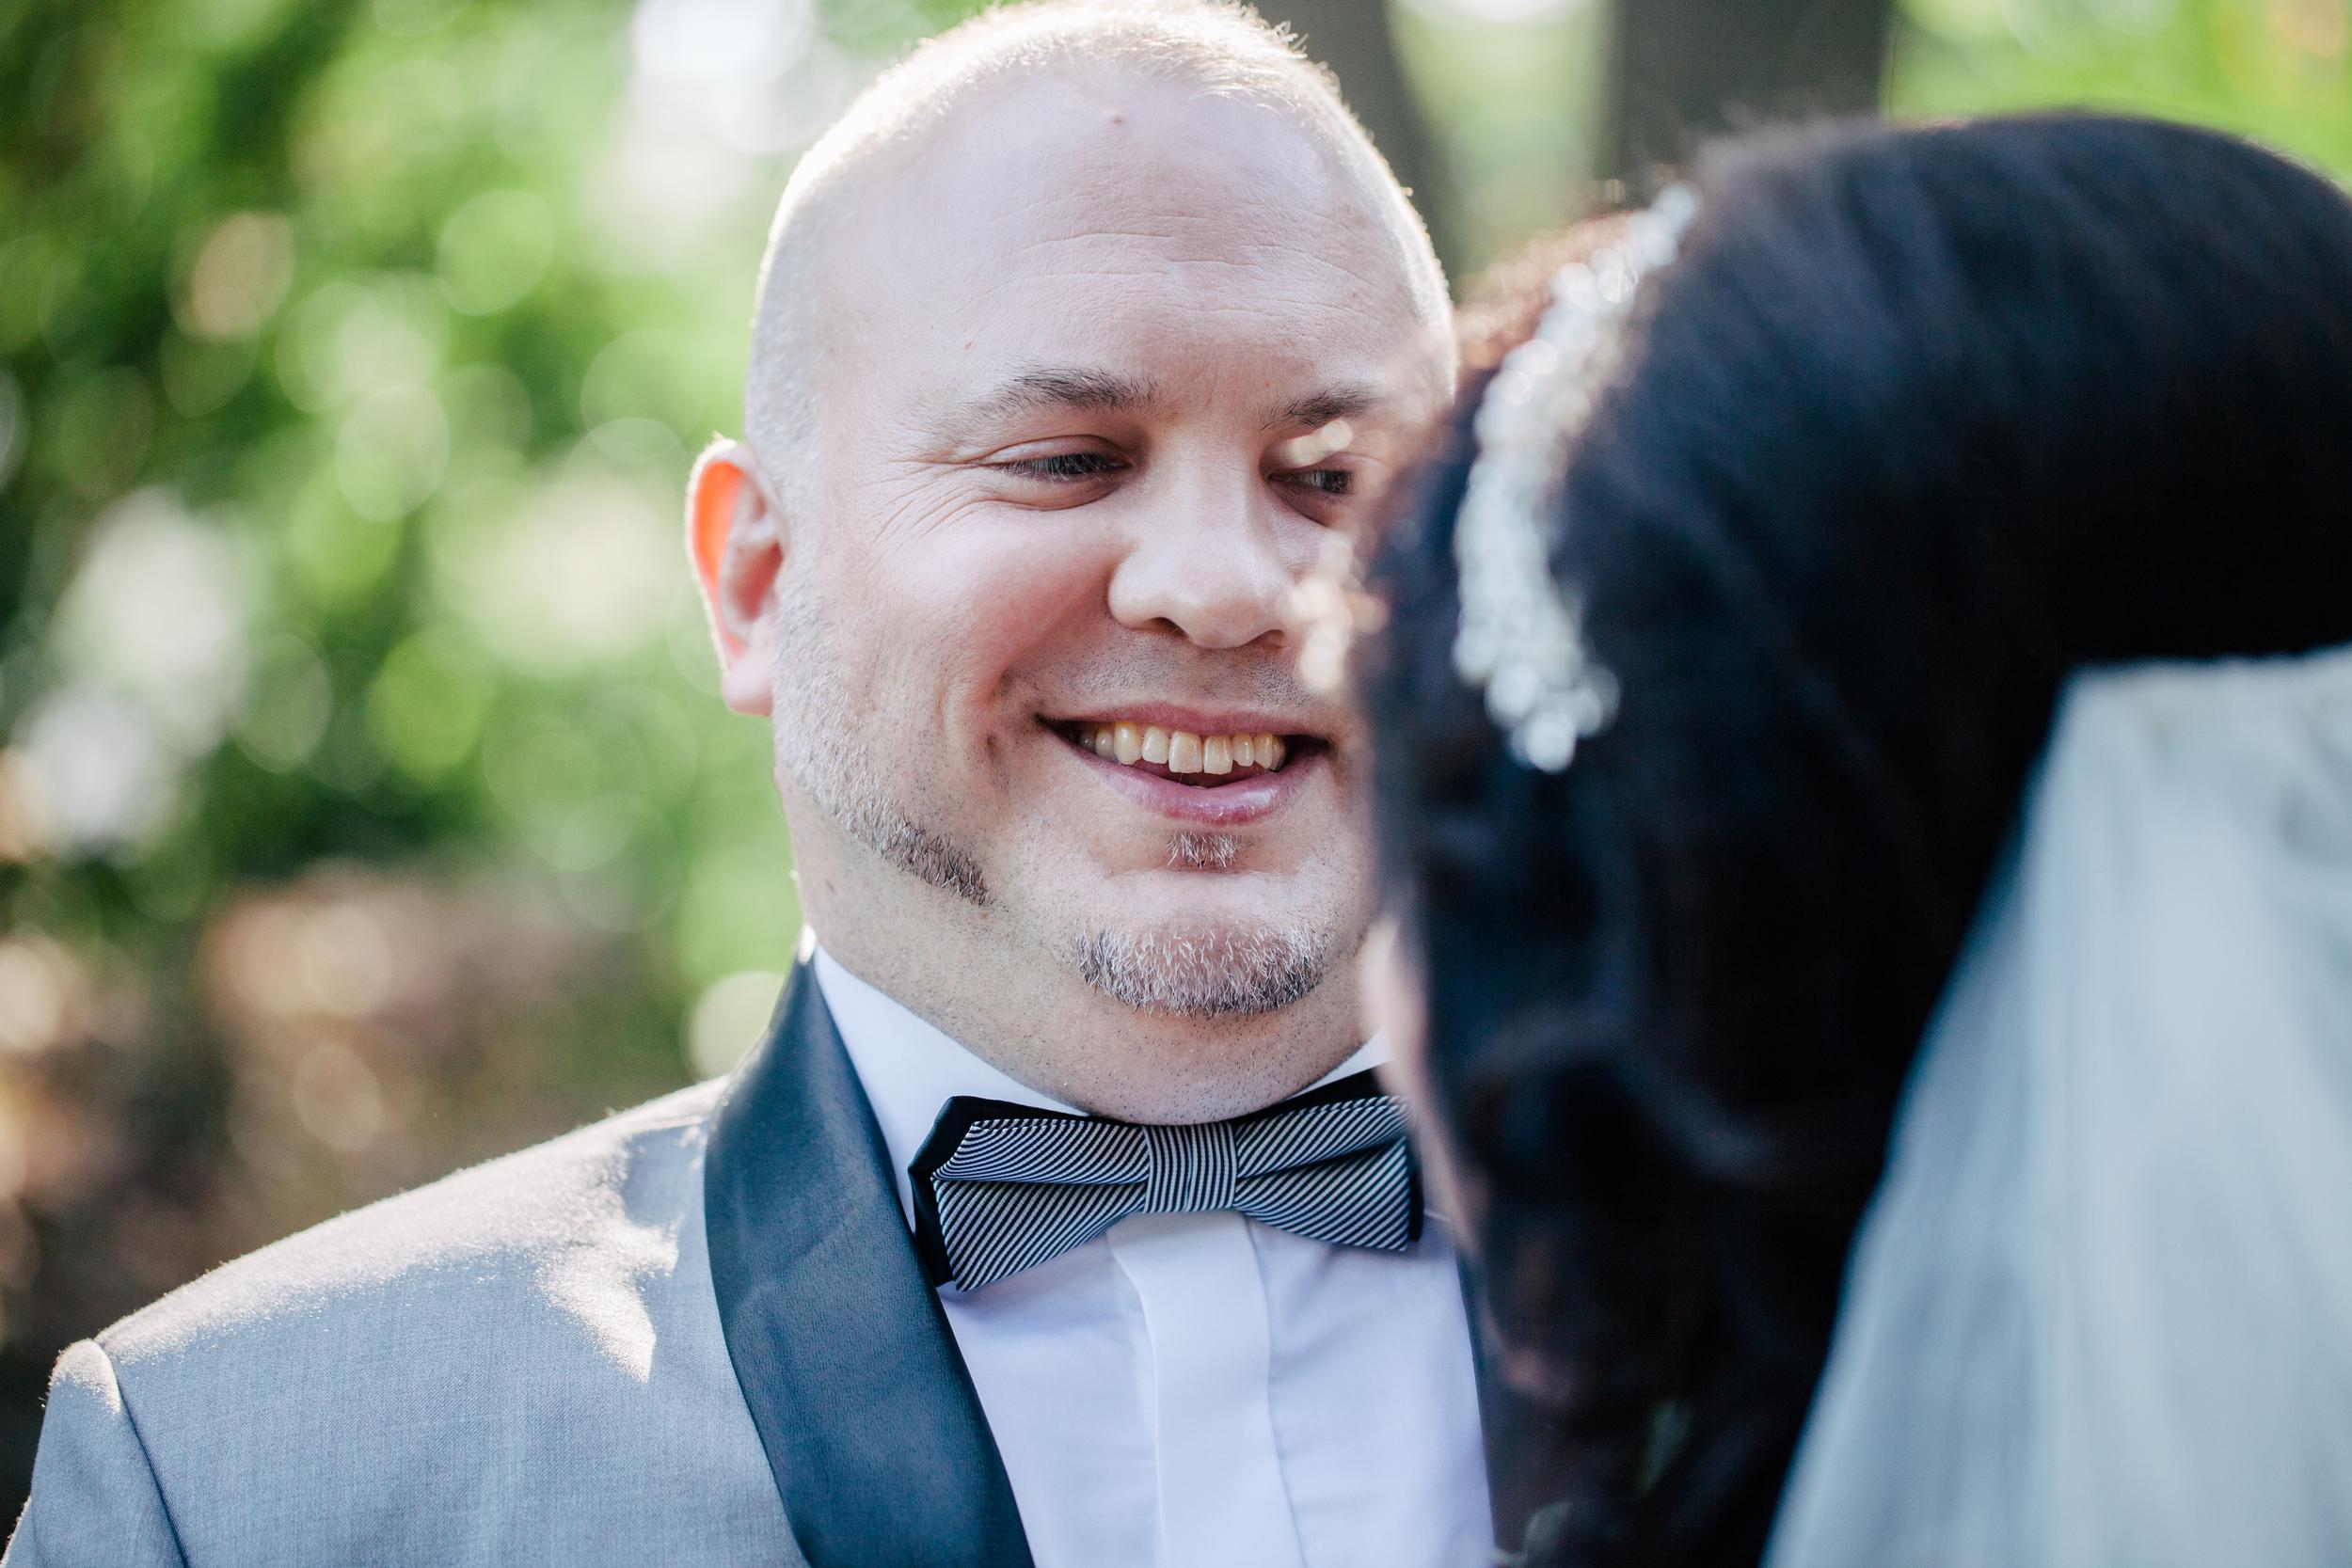 emotional look of groom on his wedding day